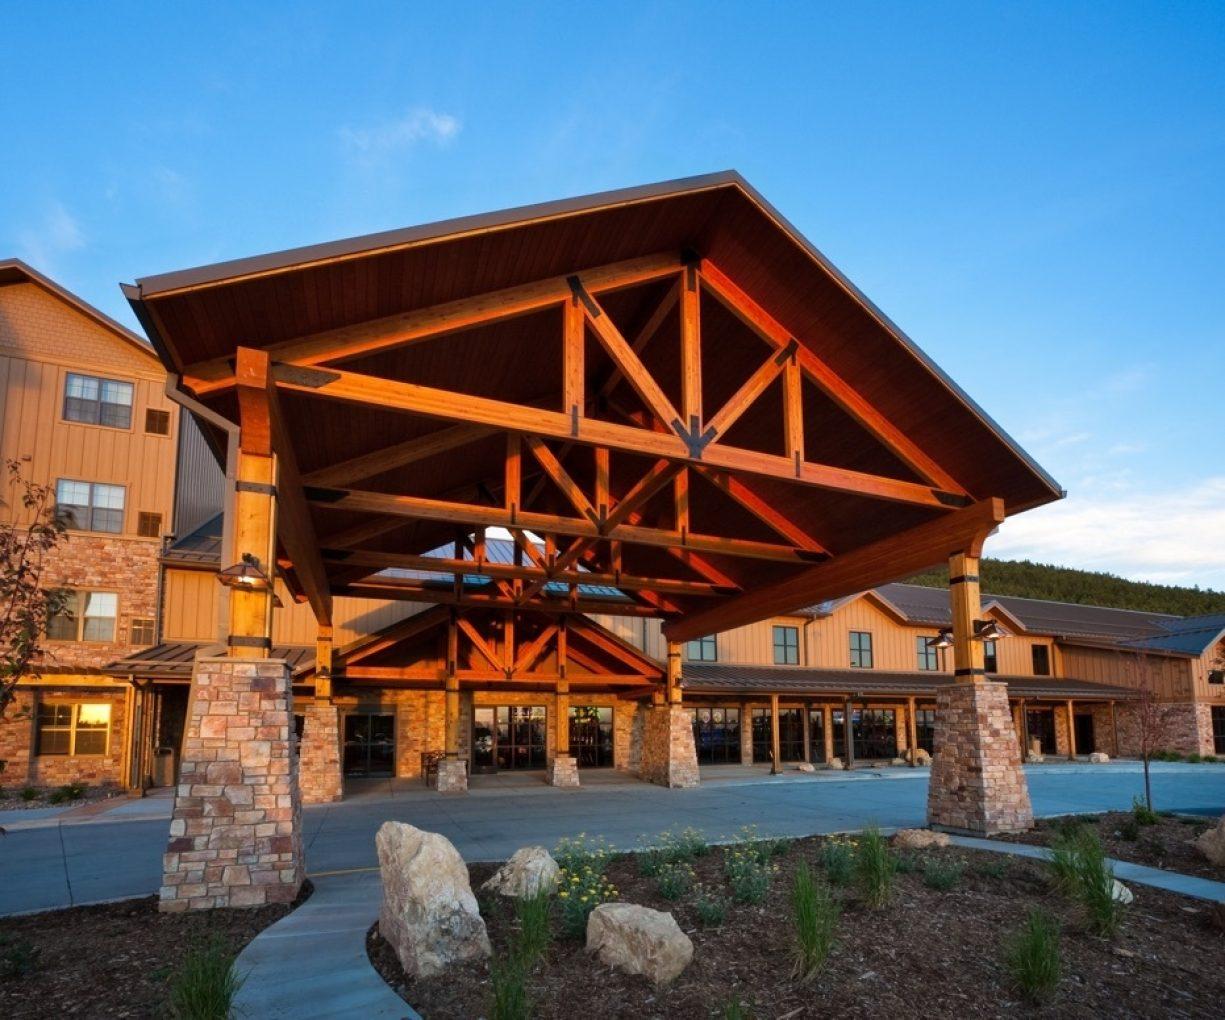 Exterior view of Lodge at Deadwood Gaming Resort